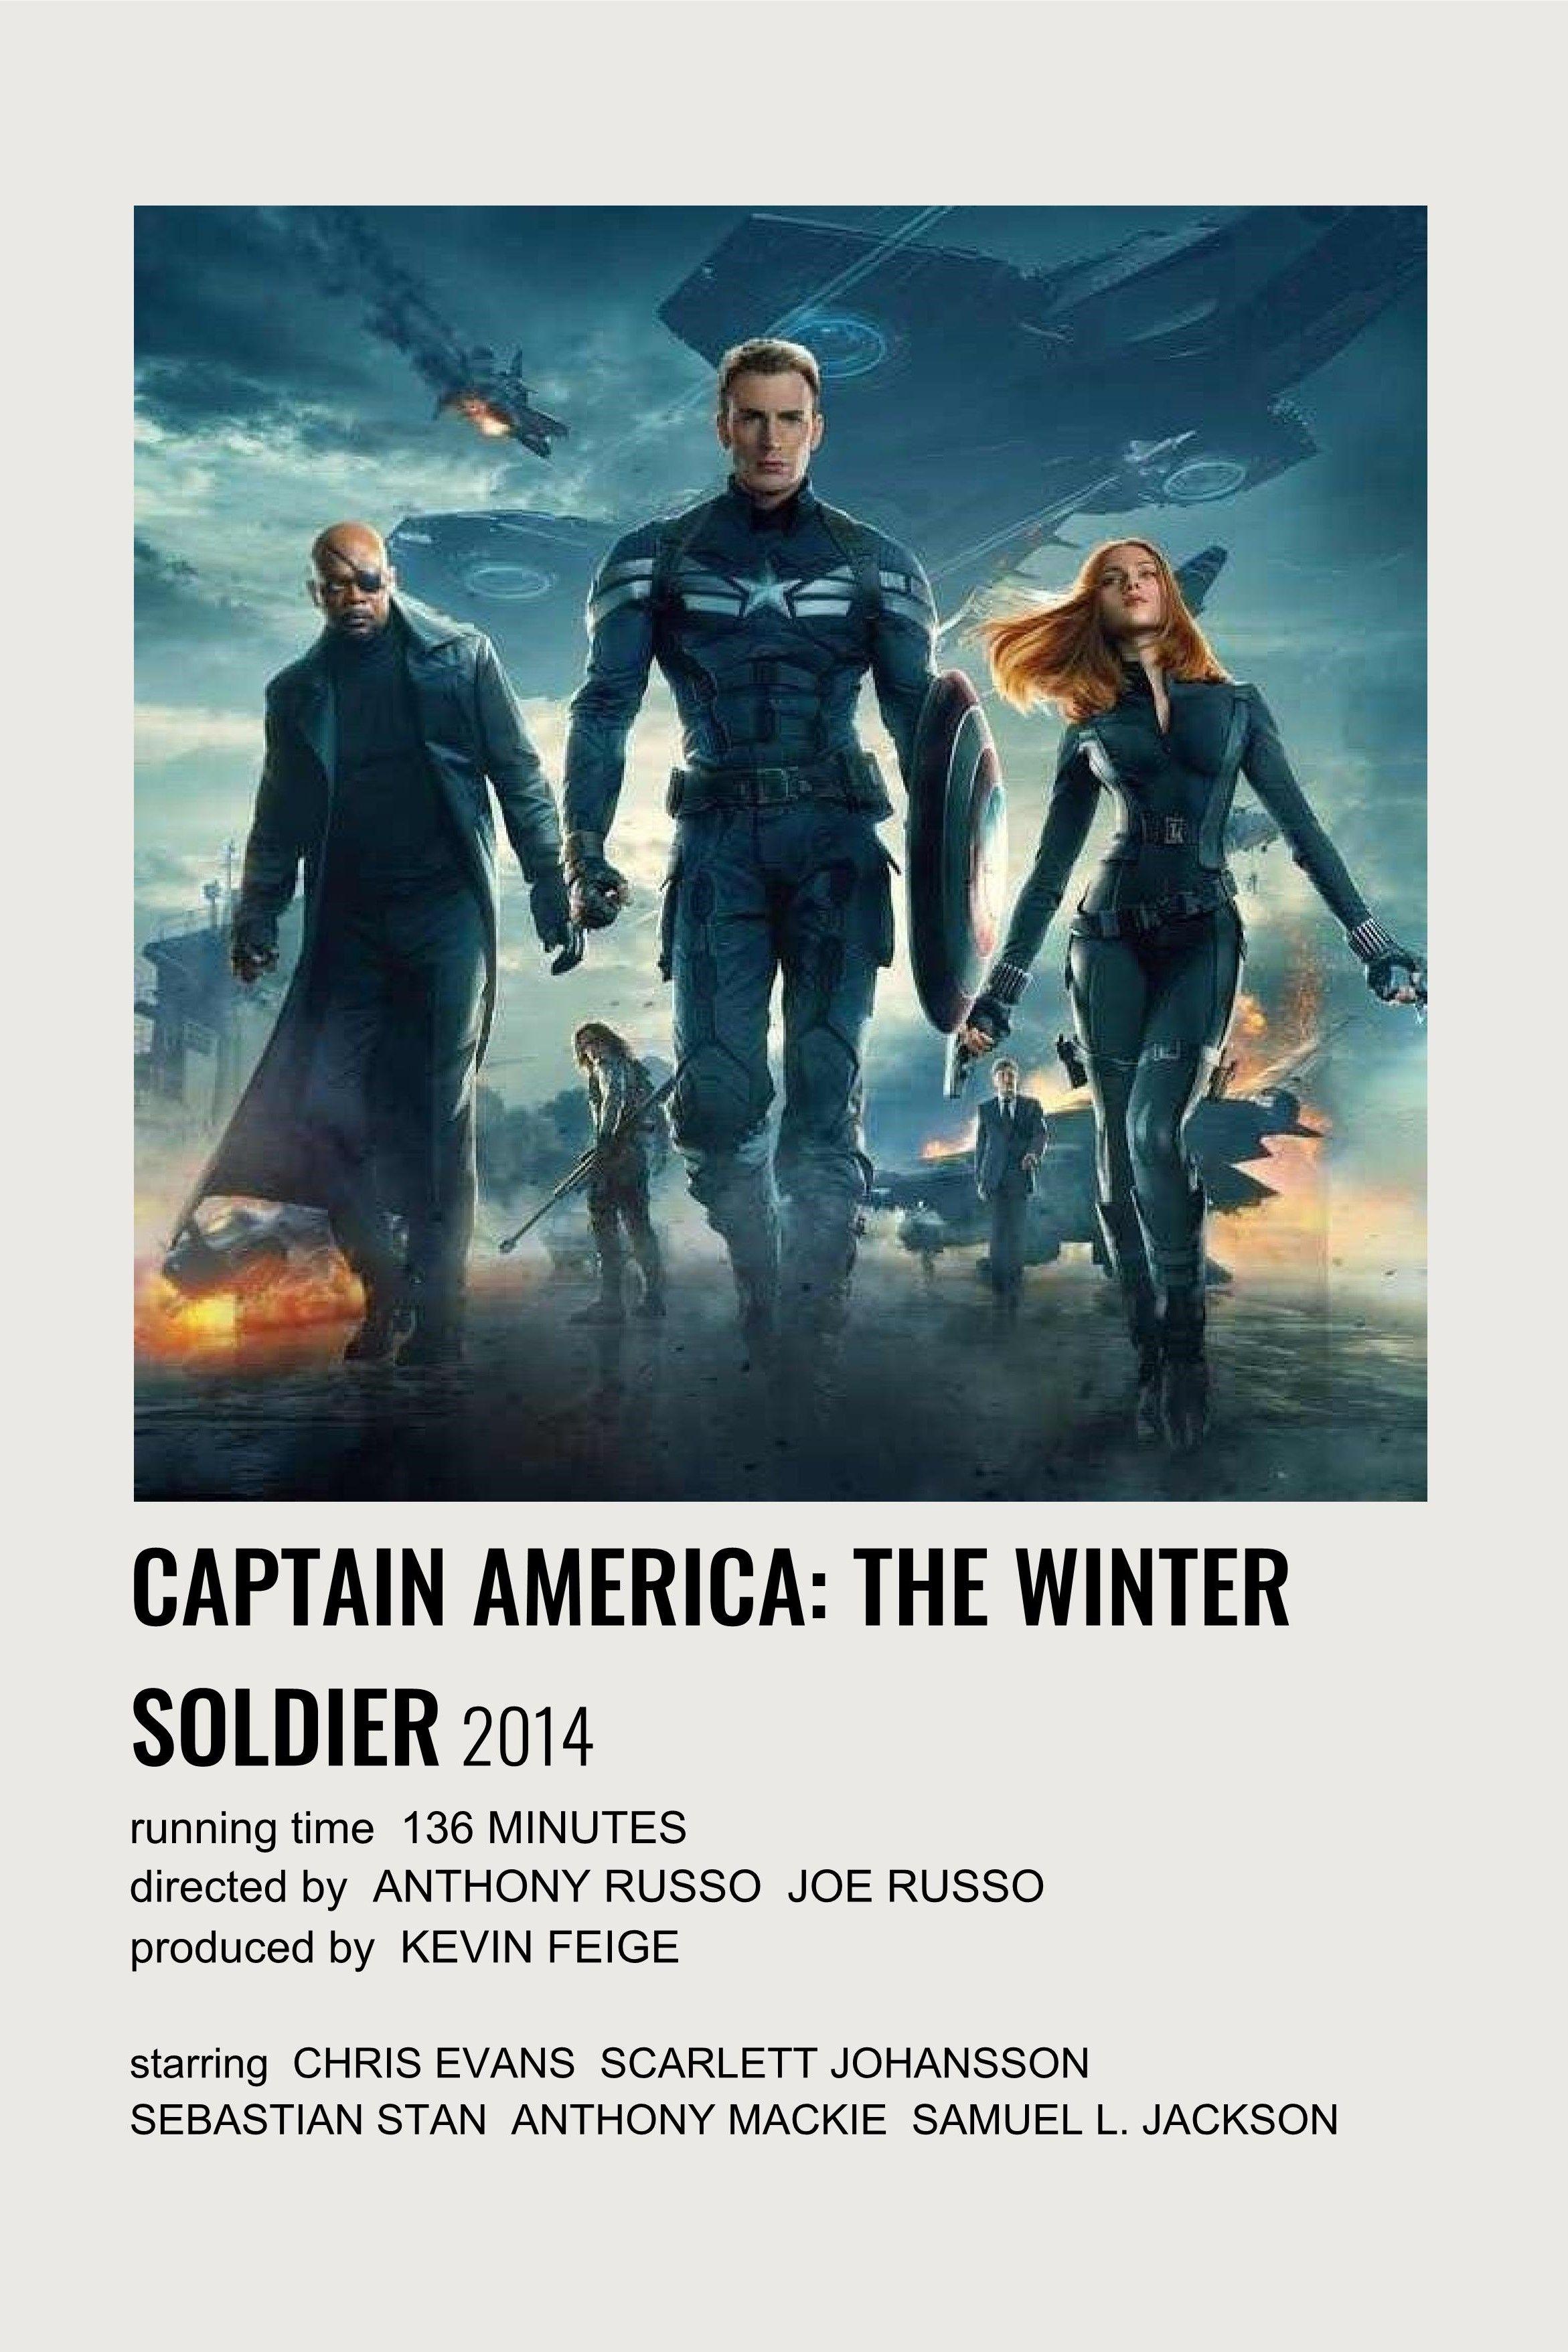 captain america: the winter soldier polaroid film poster